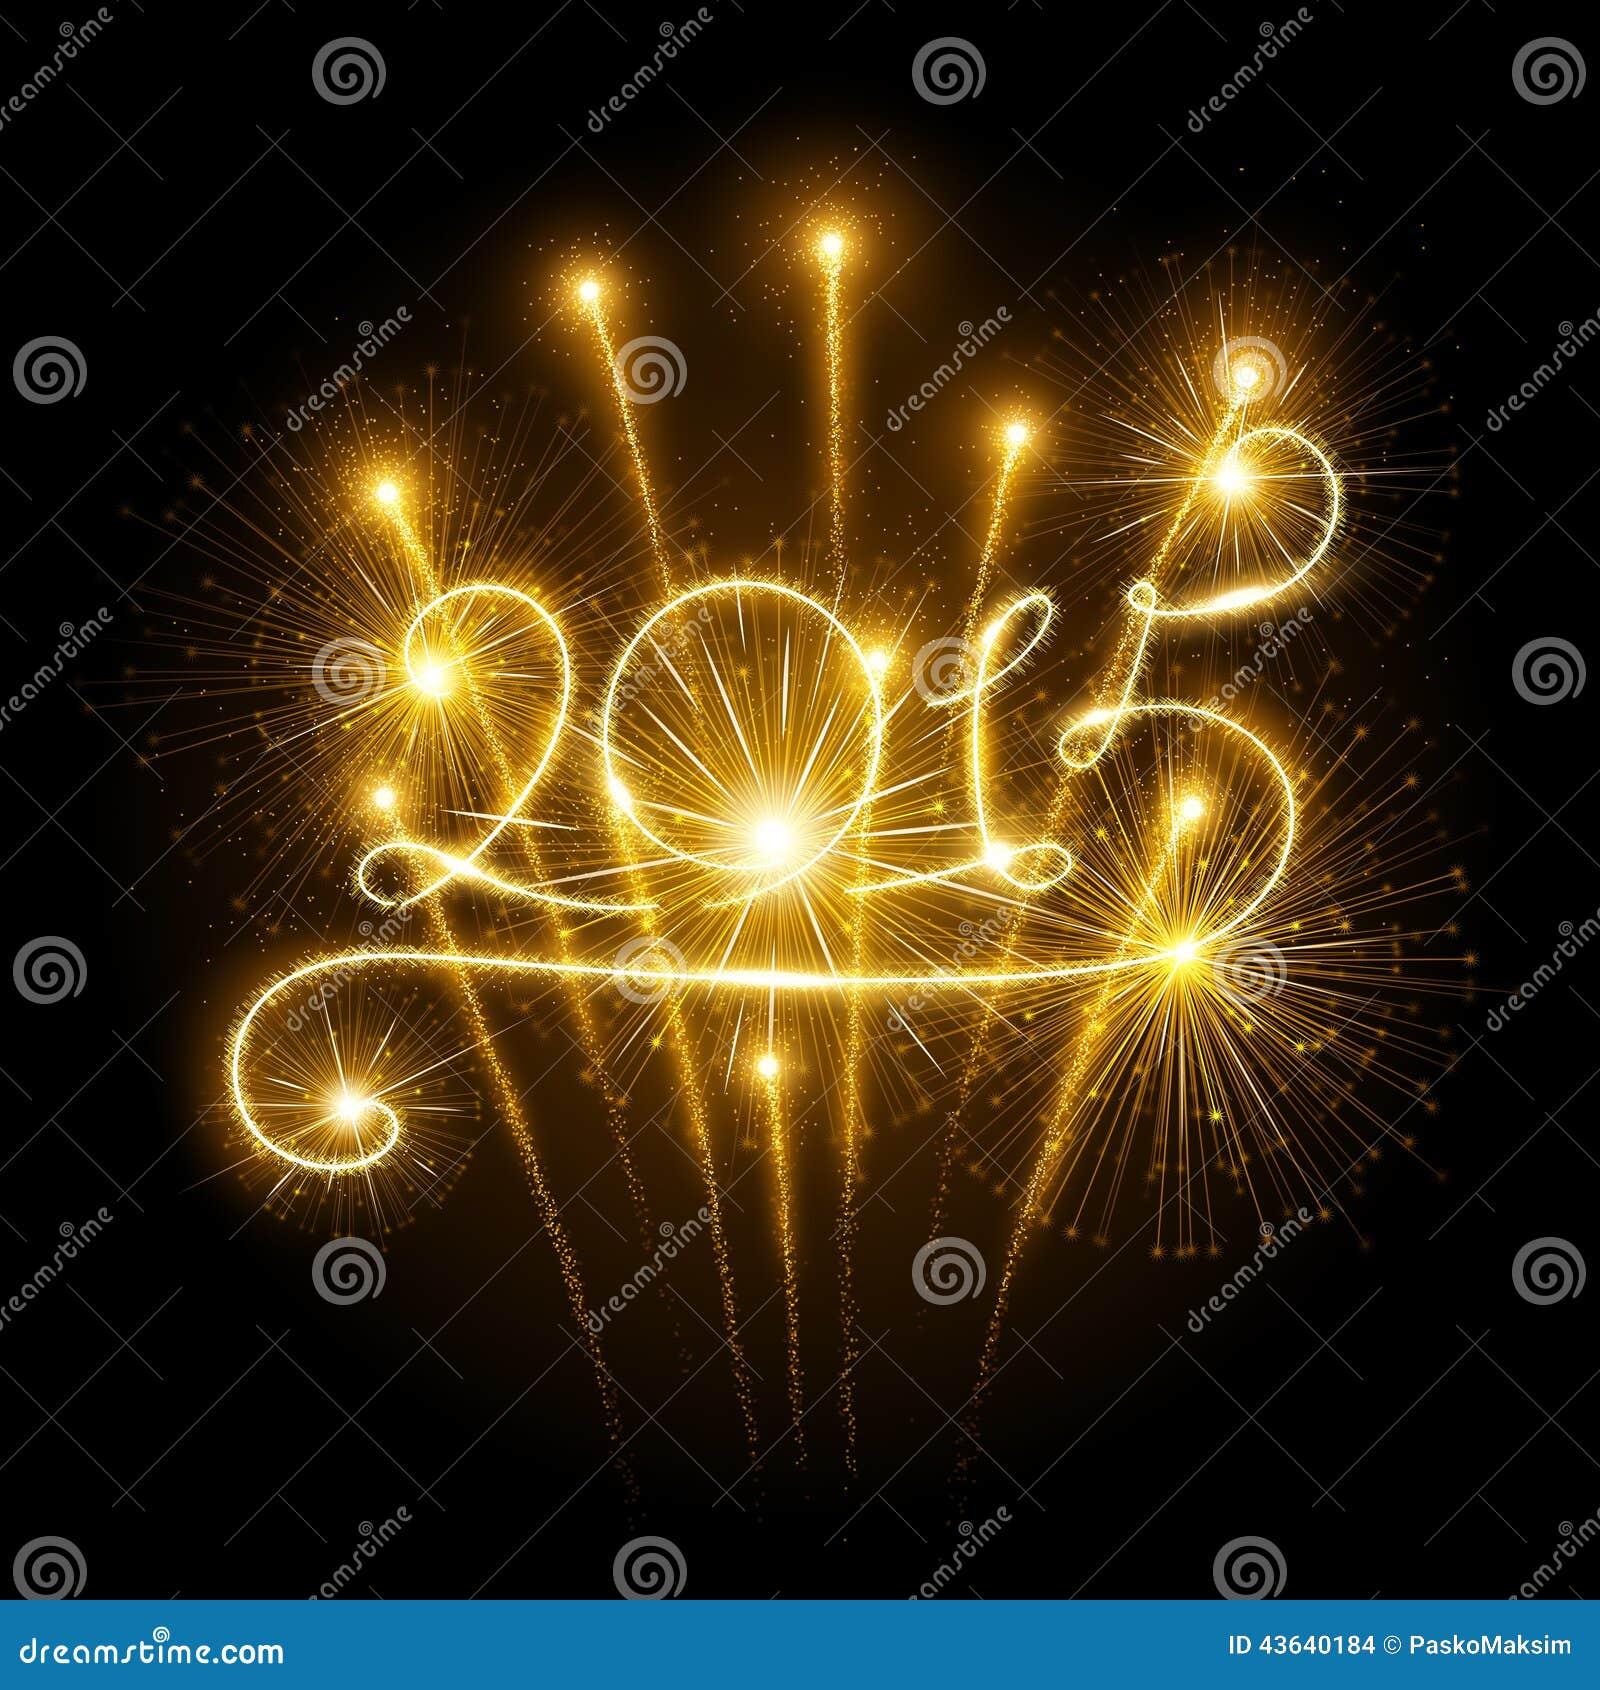 New Year 2015 fireworks